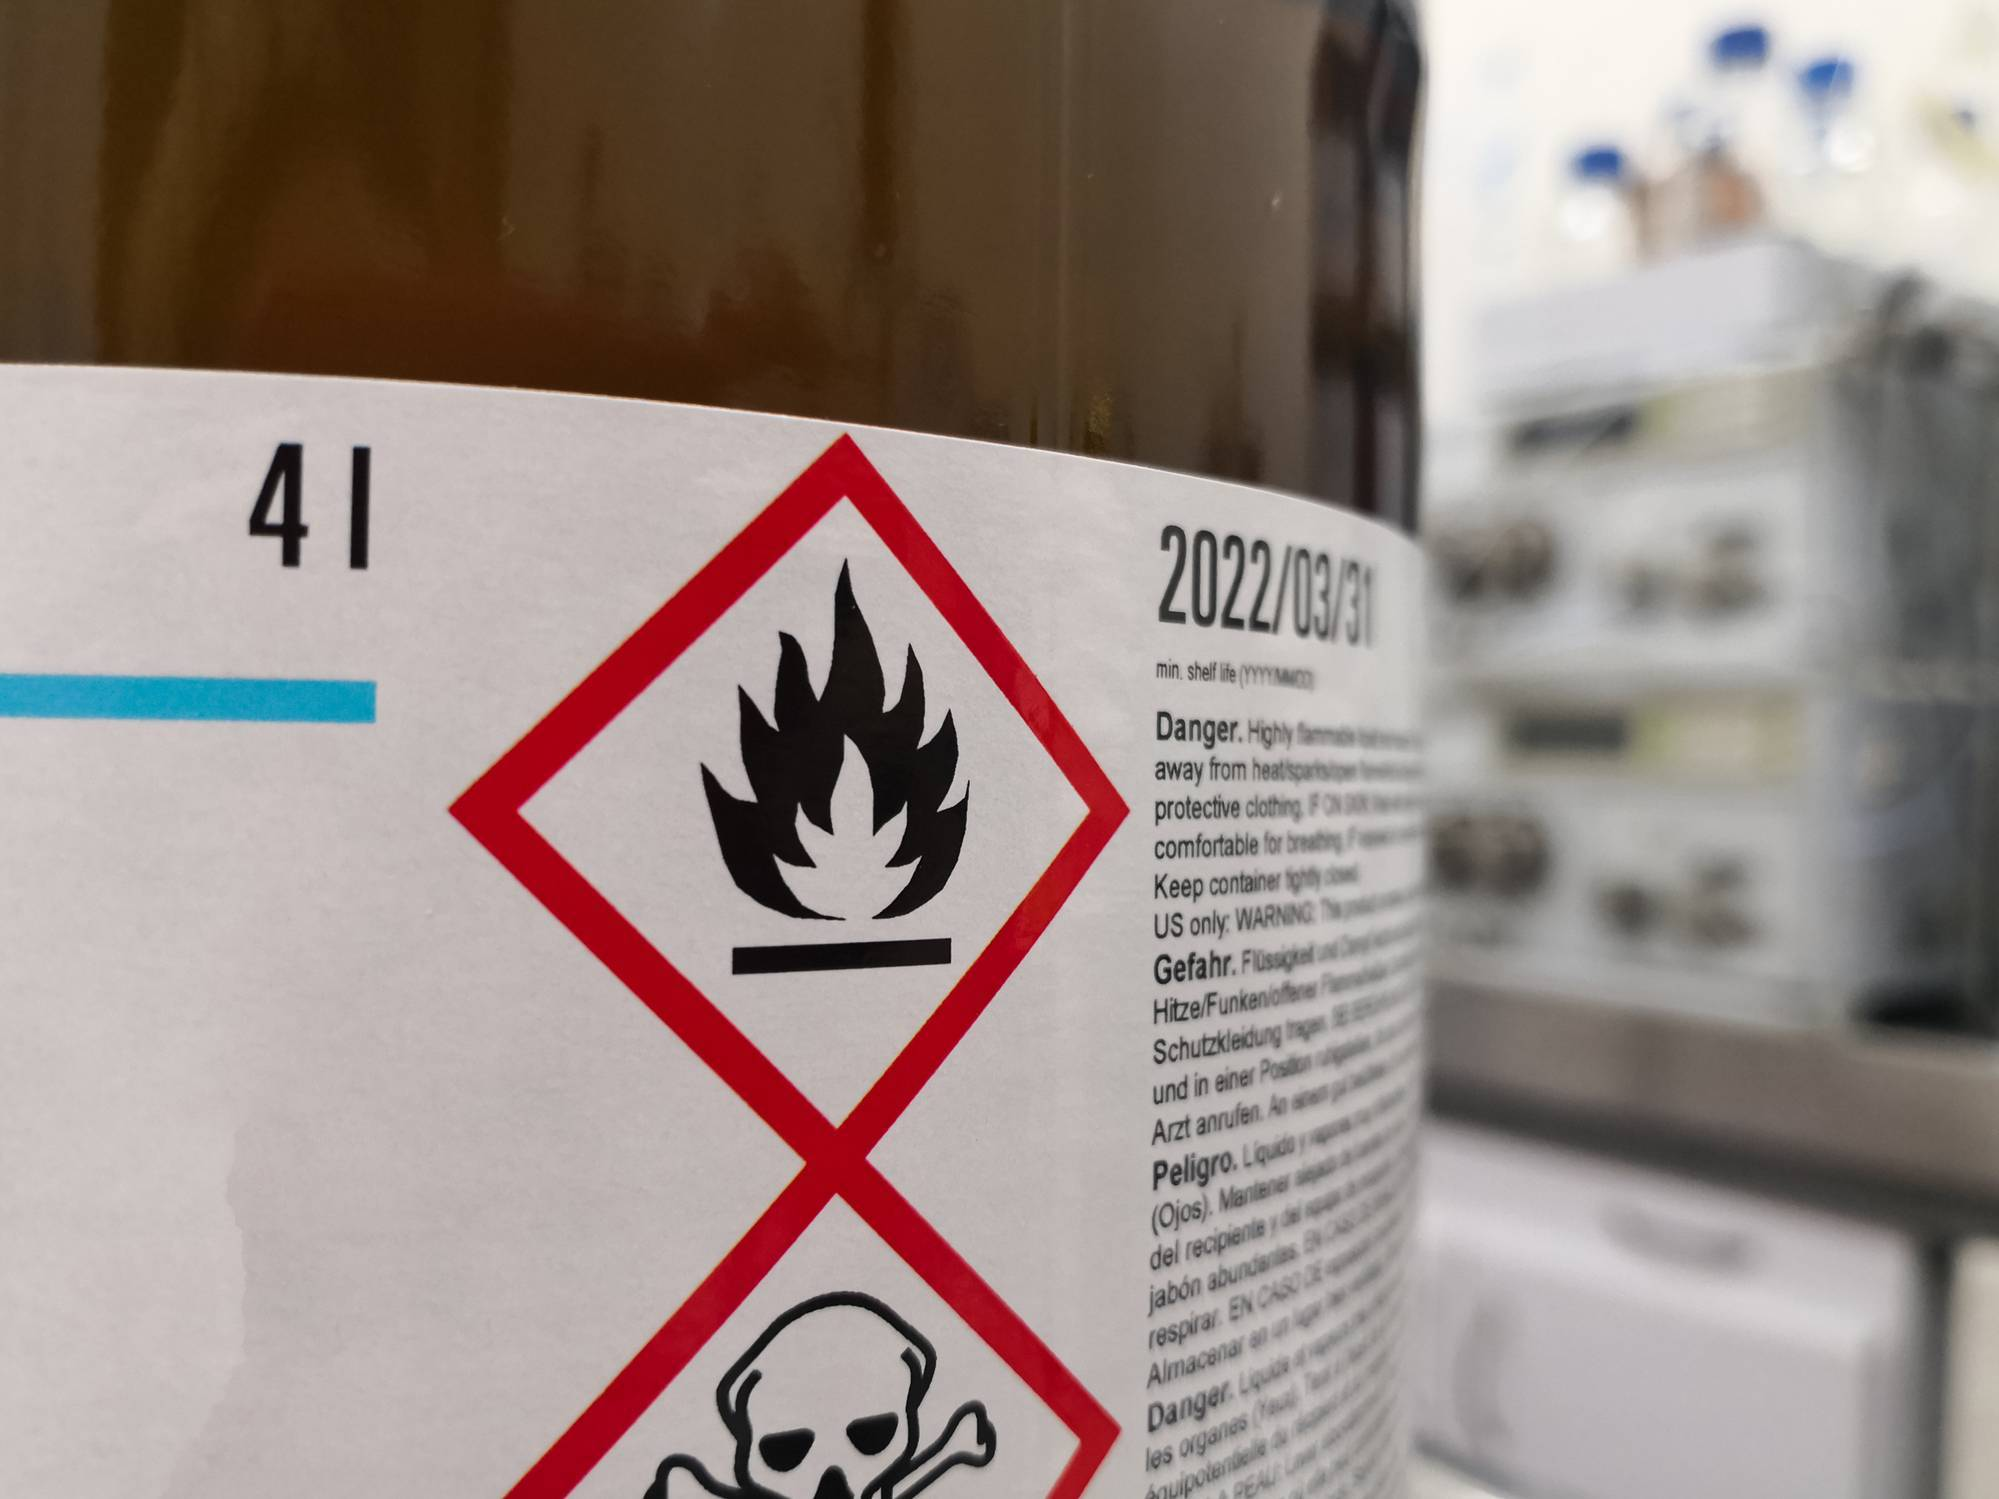 Produits dangereux armoire anti-feu